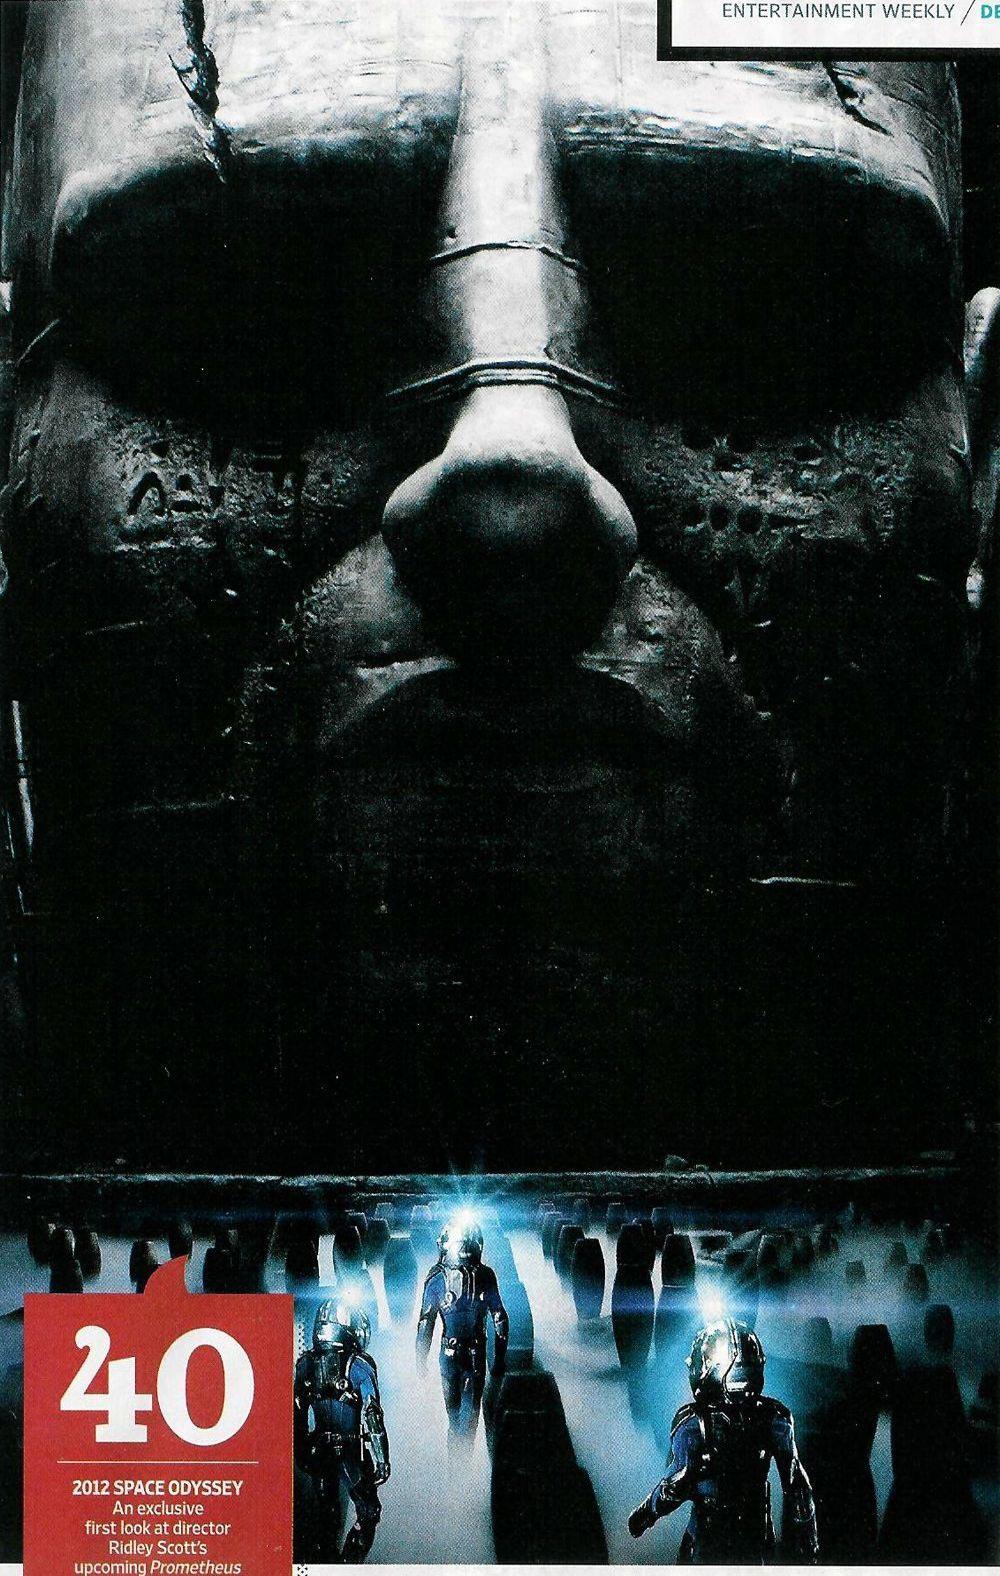 First Ridley Scott's PROMETHEUS Teaser Poster and Photos ...